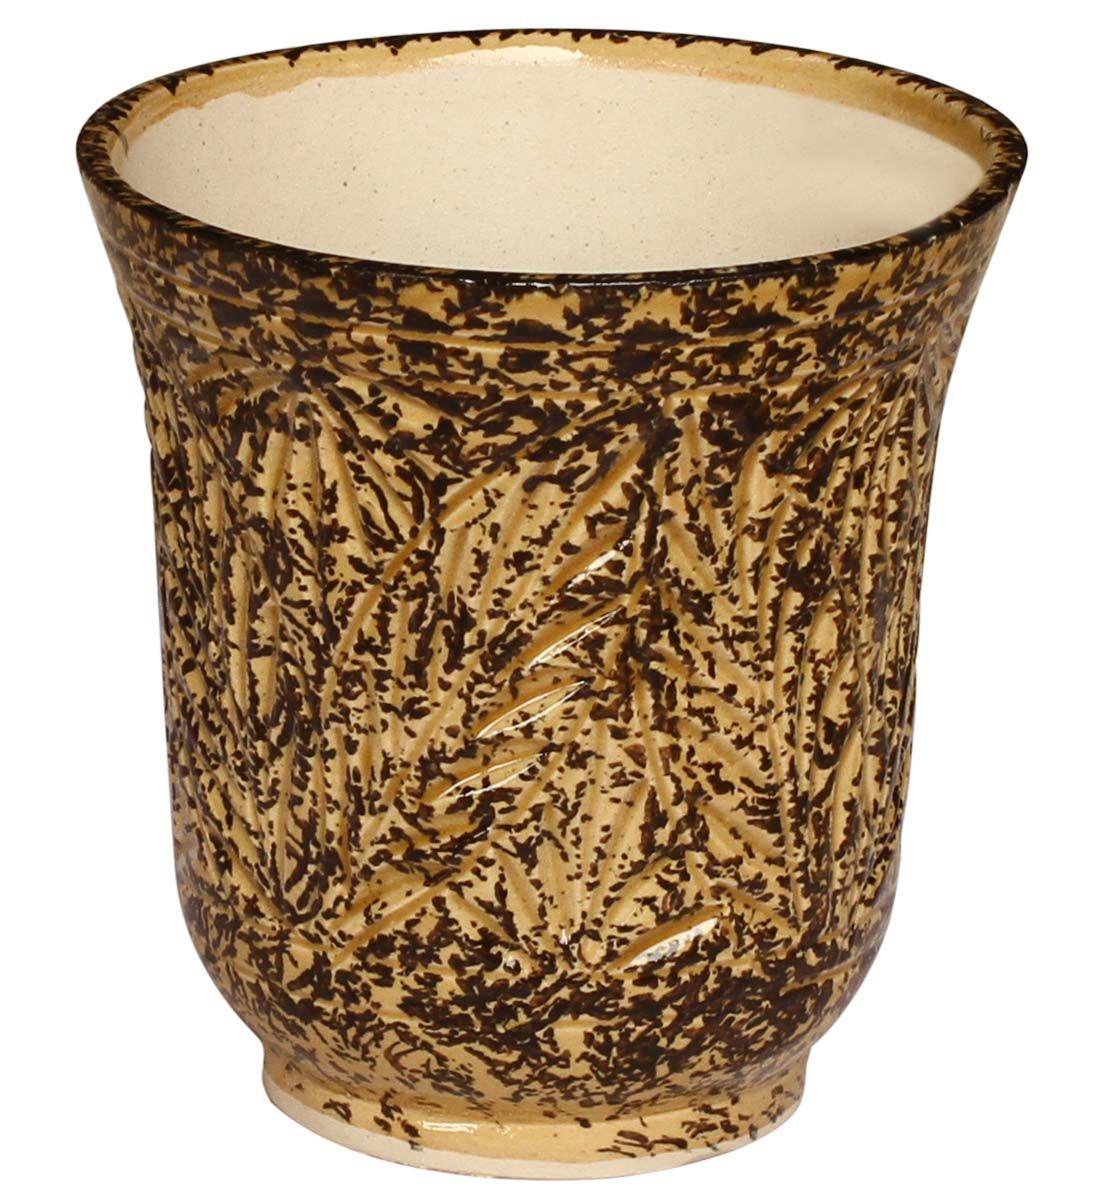 Bulk wholesale 71 handmade ceramic planter hand